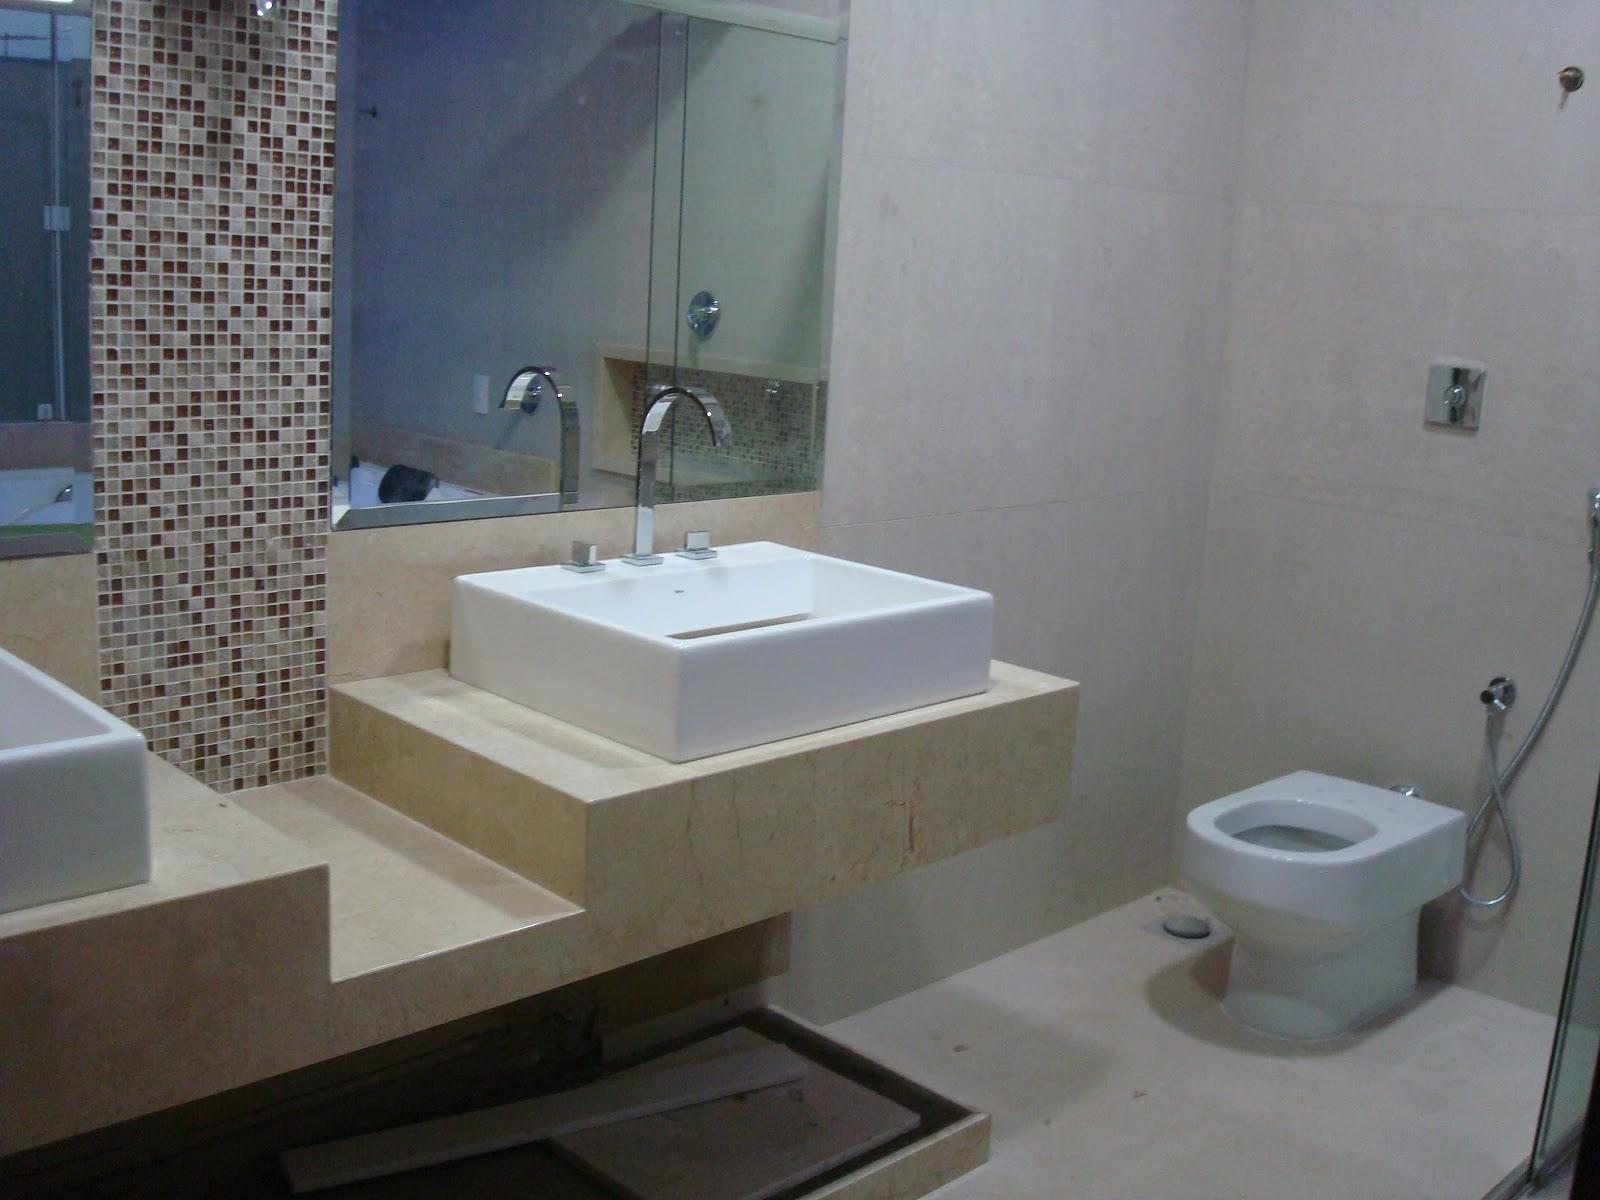 Banheiro Crema tim tim por tim tim!! #424C62 1600x1200 Bancada Banheiro Crema Marfil